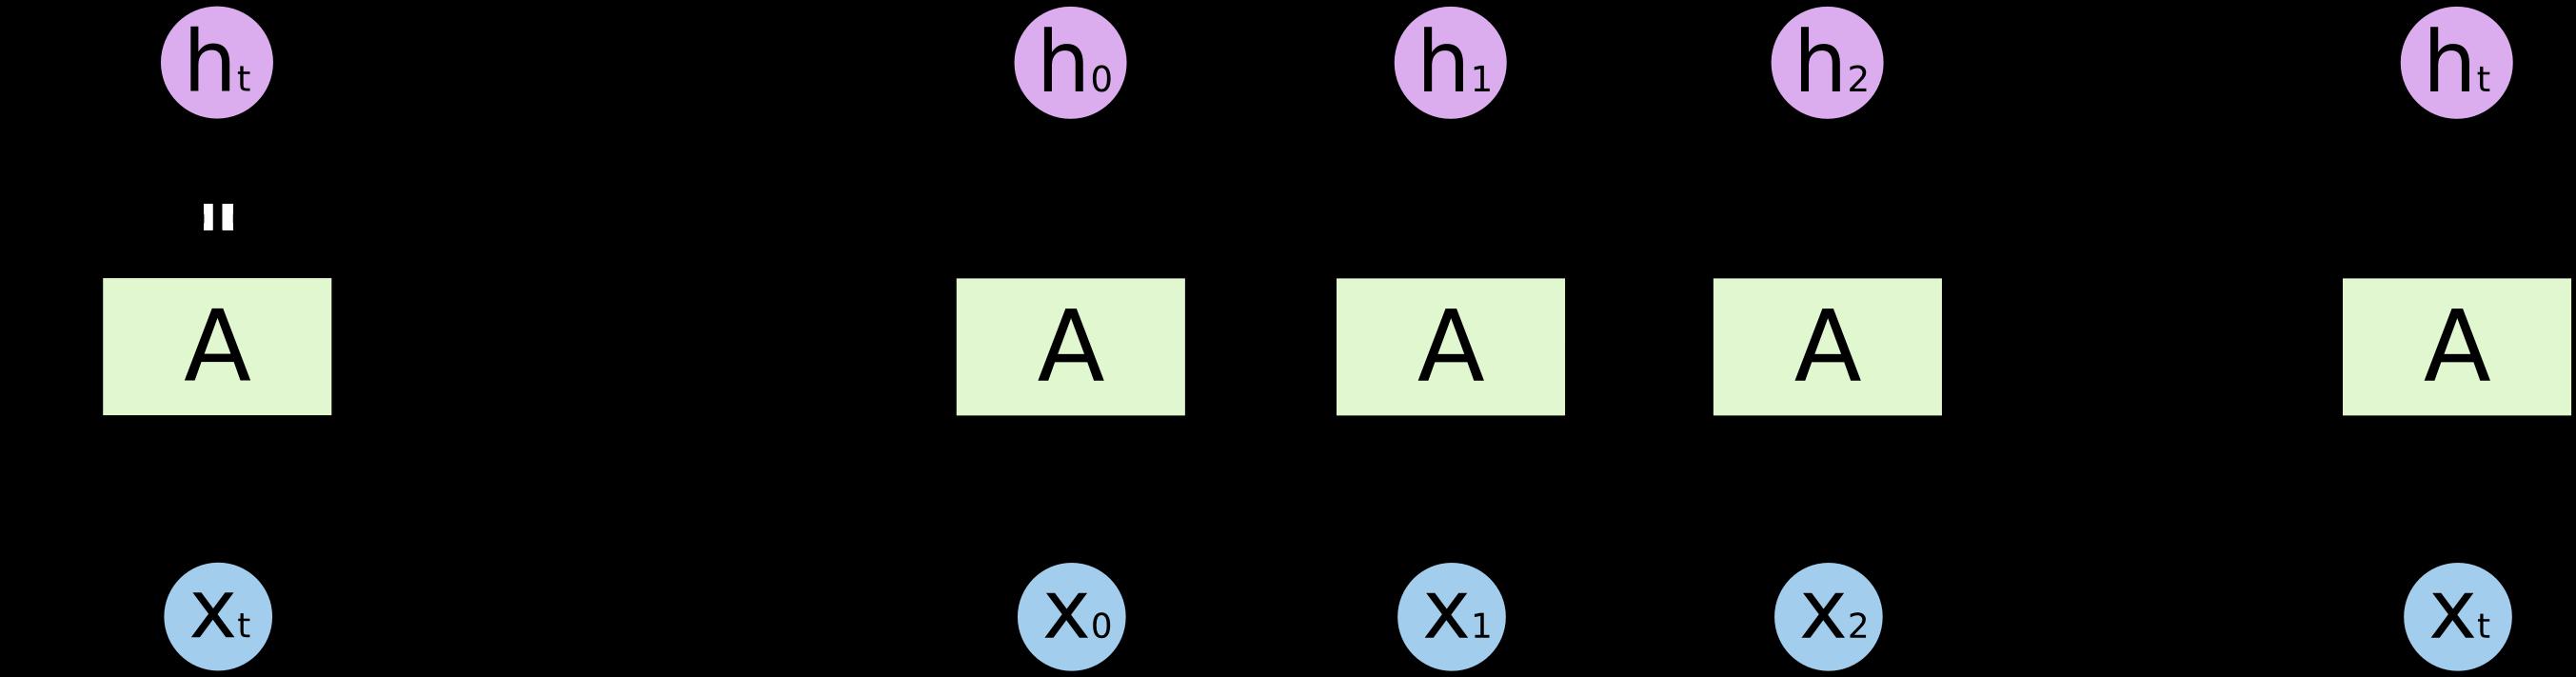 RNN的过程.png